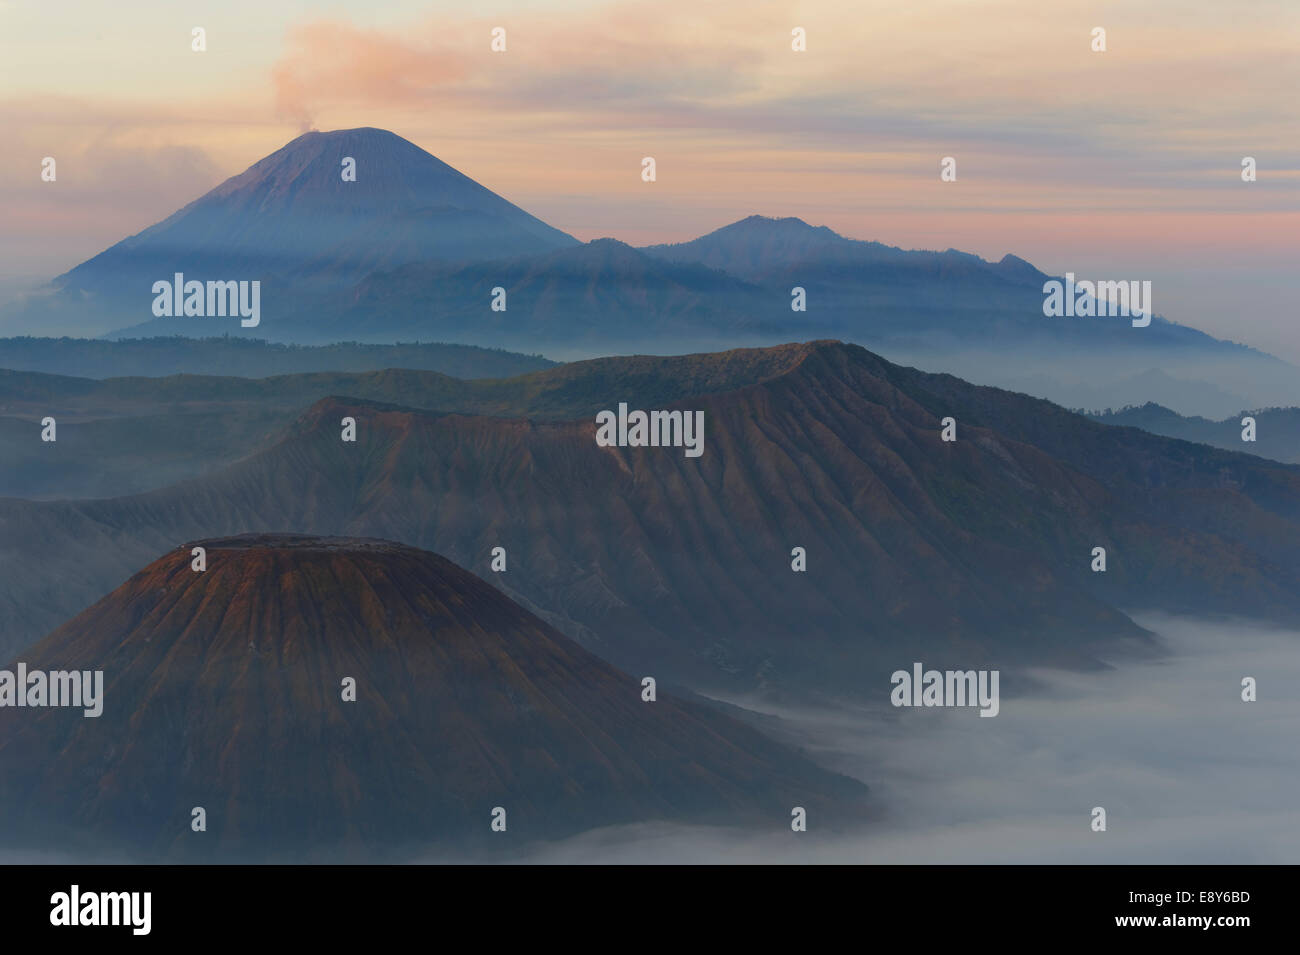 Sunrise over the smoking Gunung Bromo volcano, Bromo-Tengger-Semeru National Park, Java, Indonesia, Asia - Stock Image